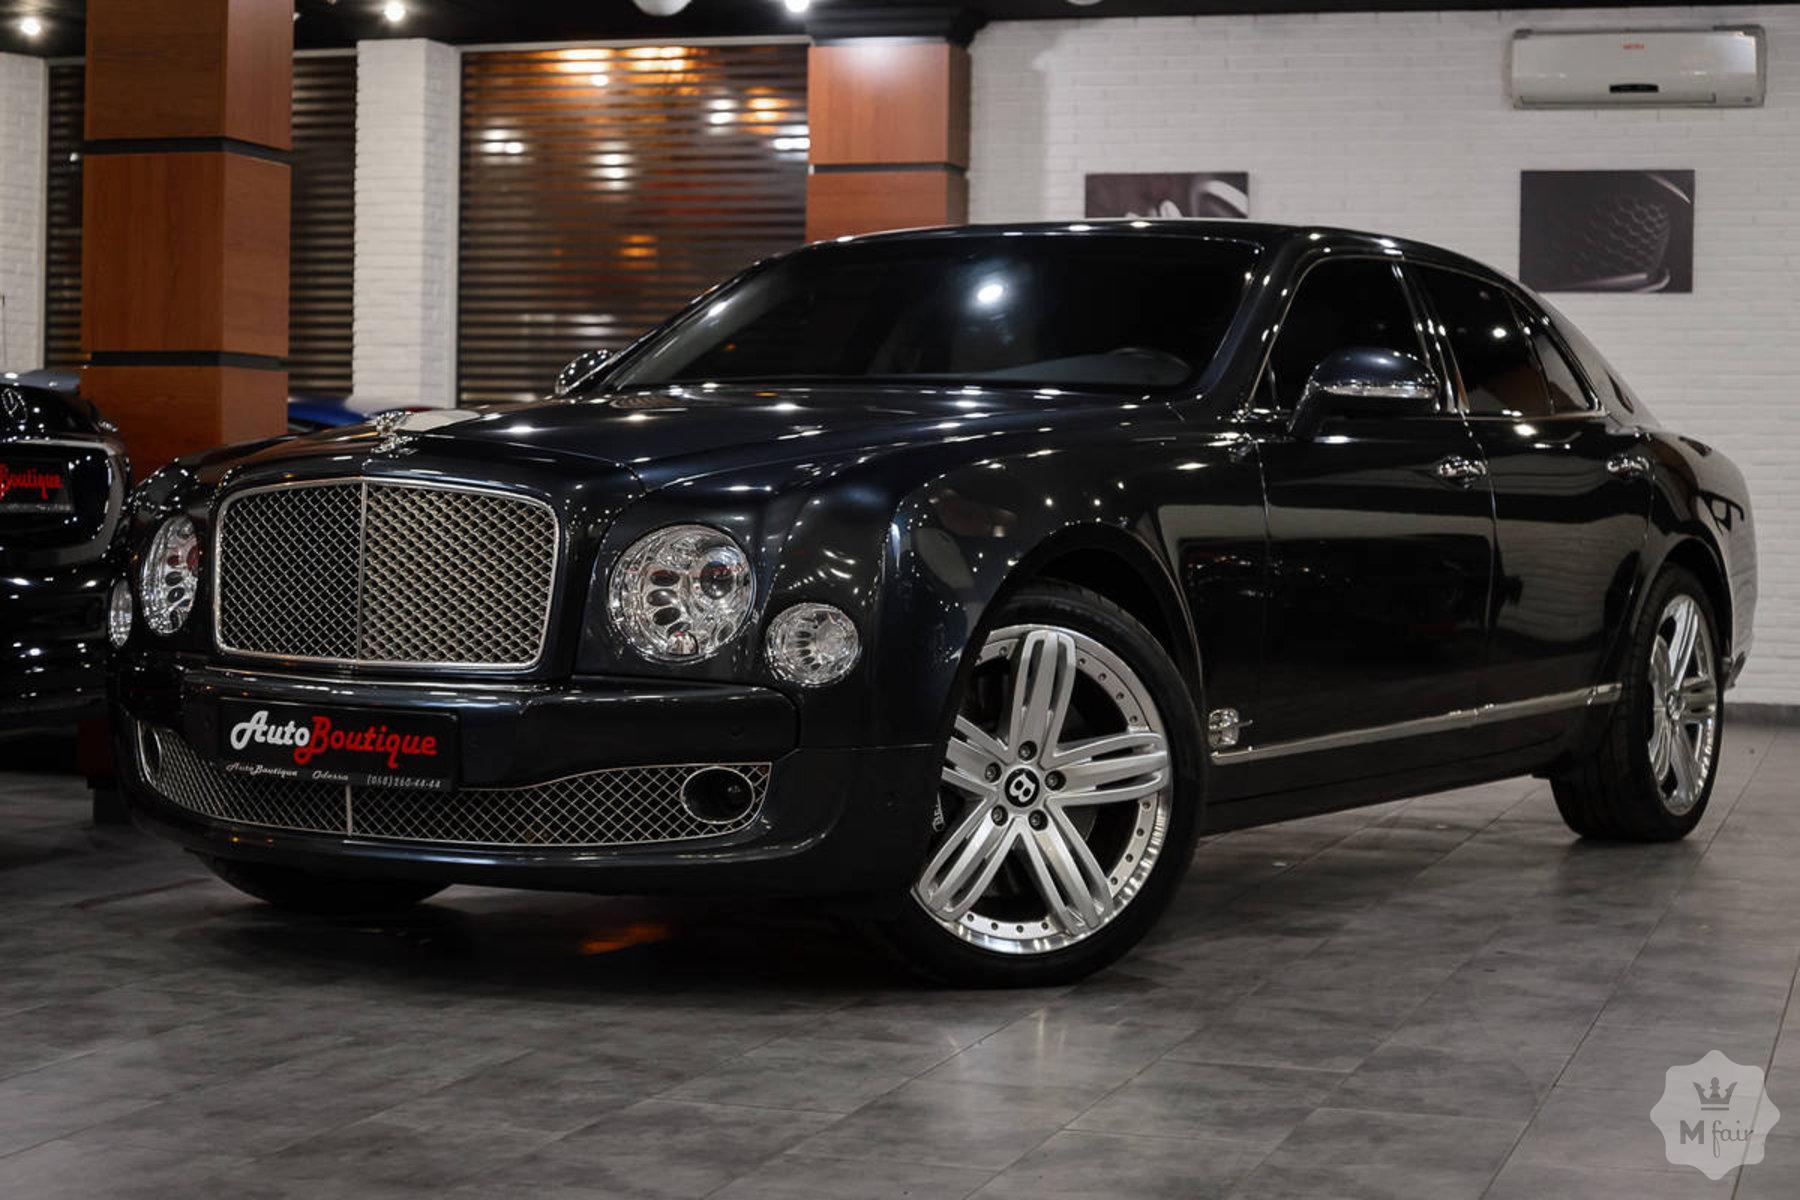 Продажа Bentley Mulsanne 6 75 V8 в Одессе на Mfair